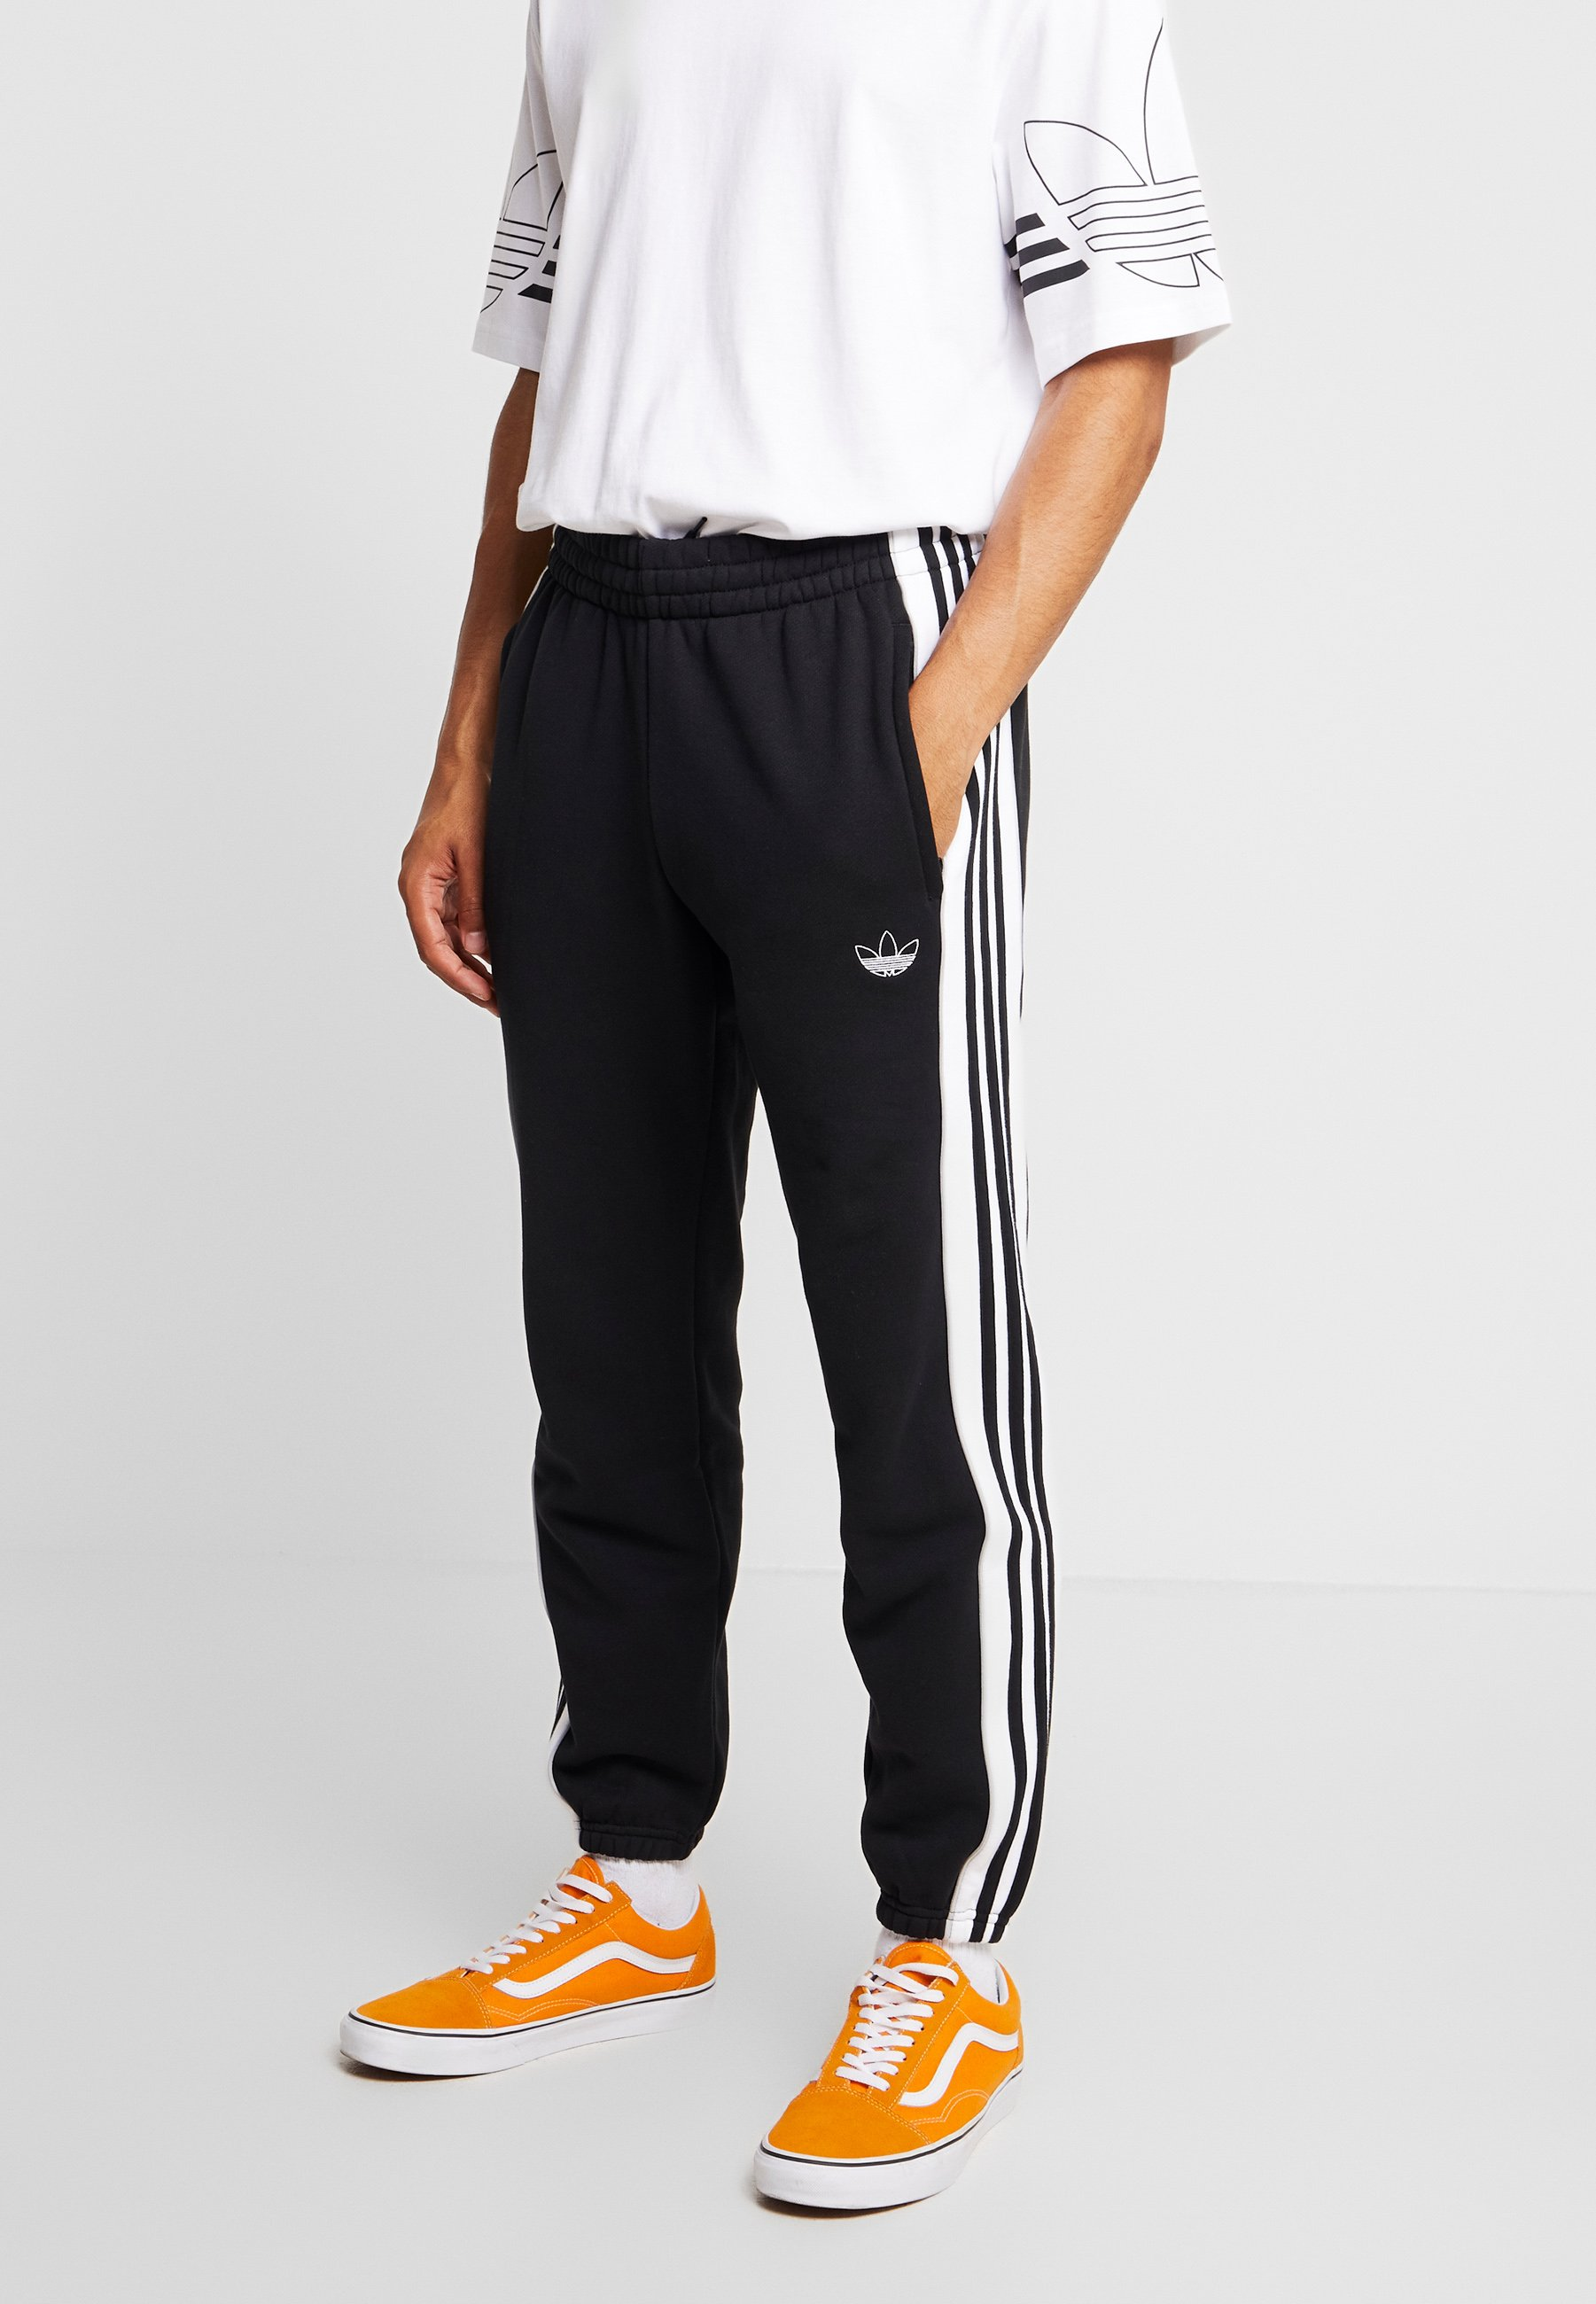 Originals De Survêtement Black white Adidas Stripe PanelPantalon PkOZiXu